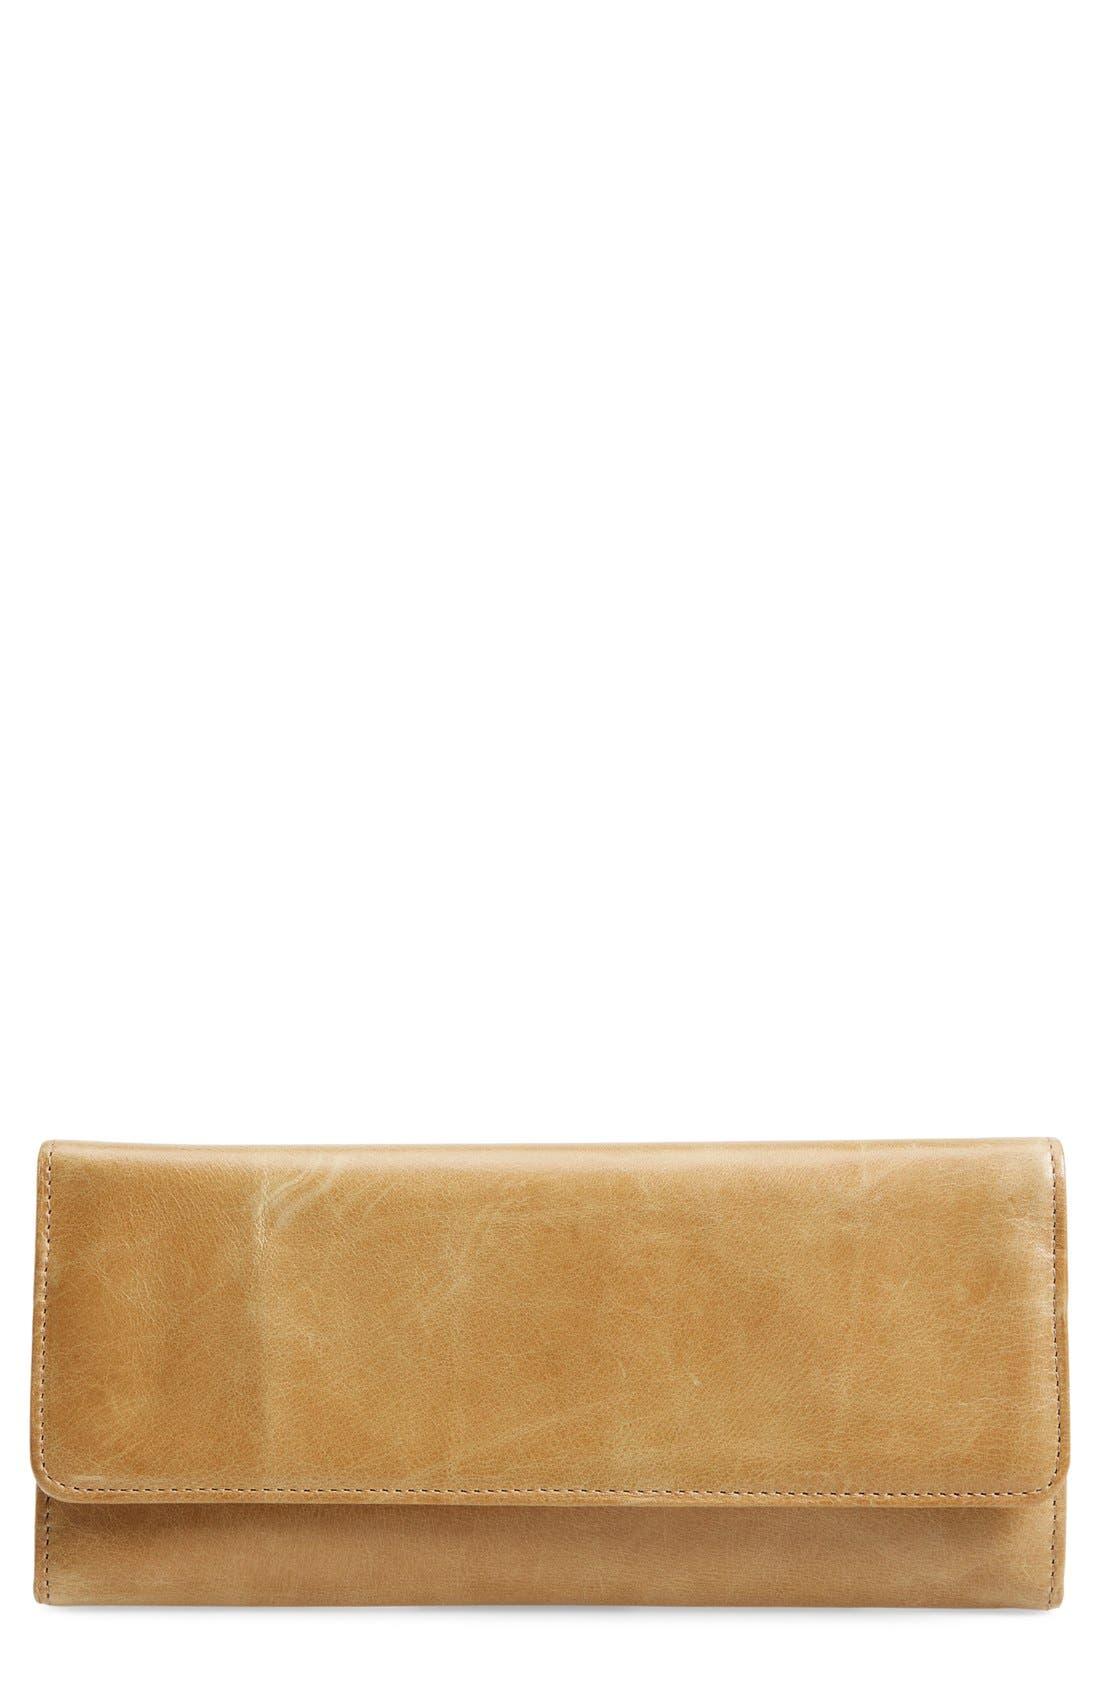 'Sadie' Leather Wallet,                             Main thumbnail 20, color,